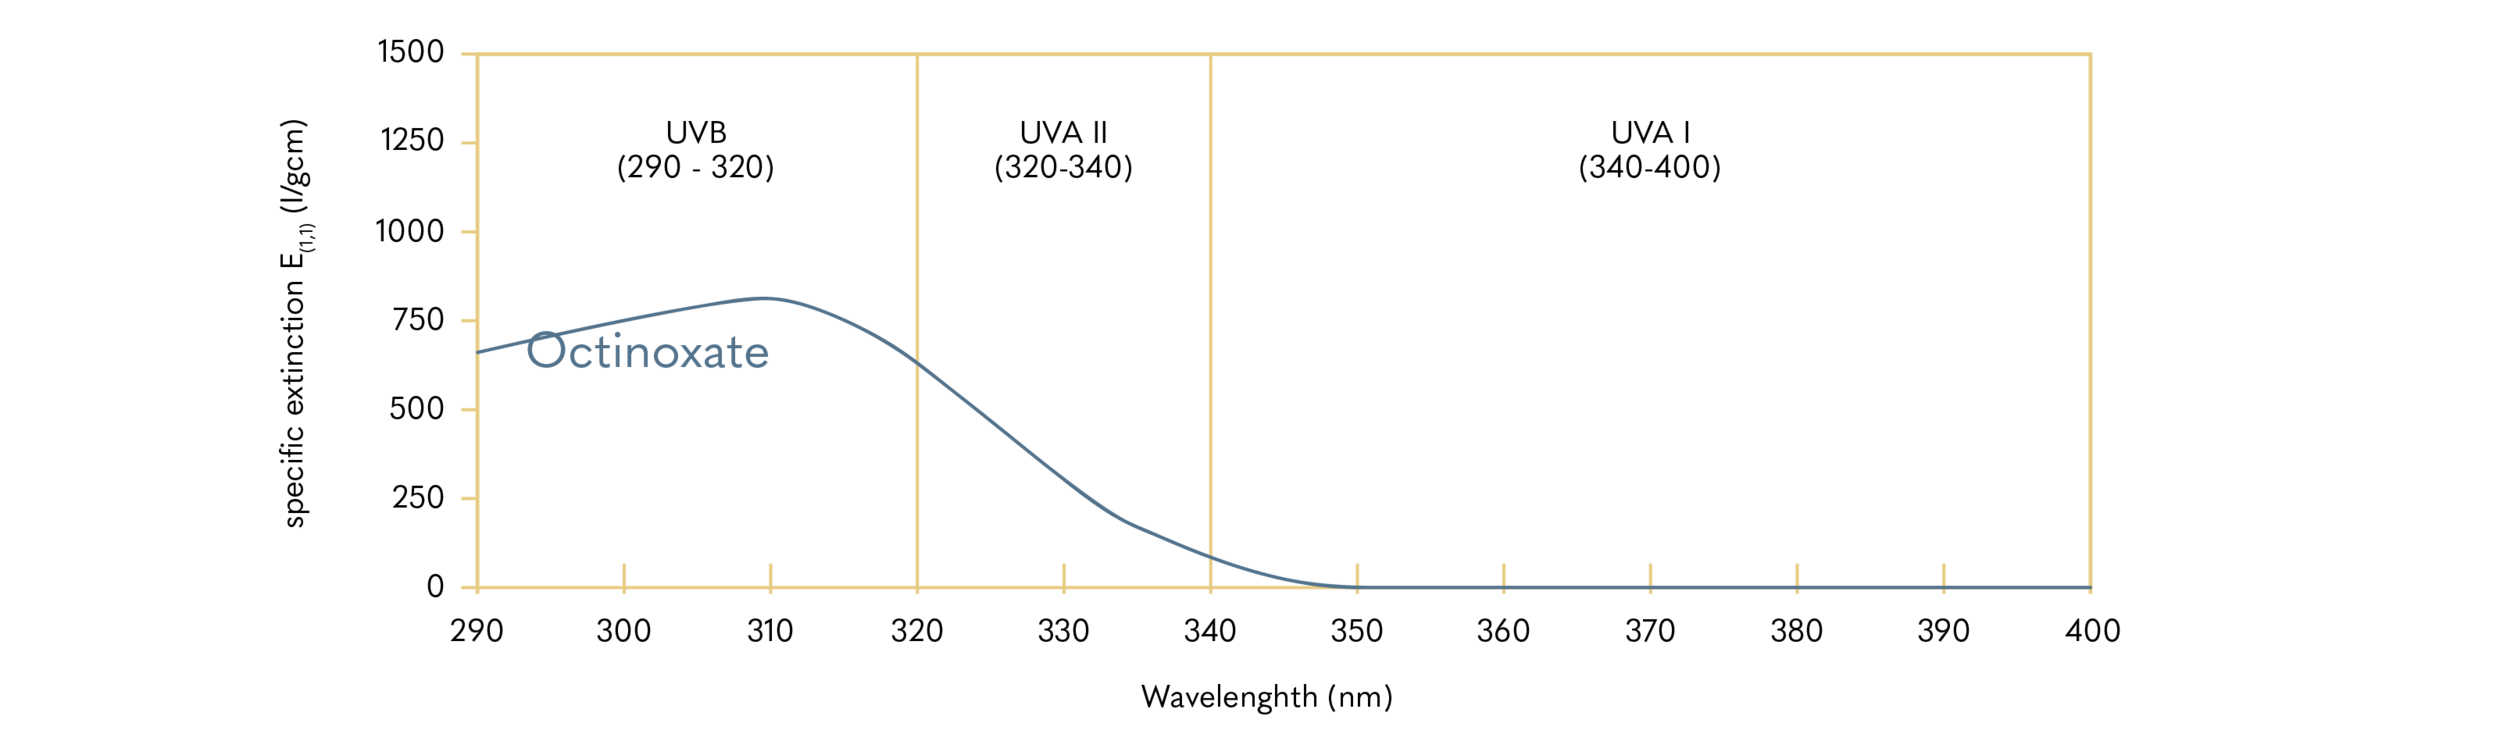 Octinoxate; INCI: Ethylhexyl Methoxycinnamate